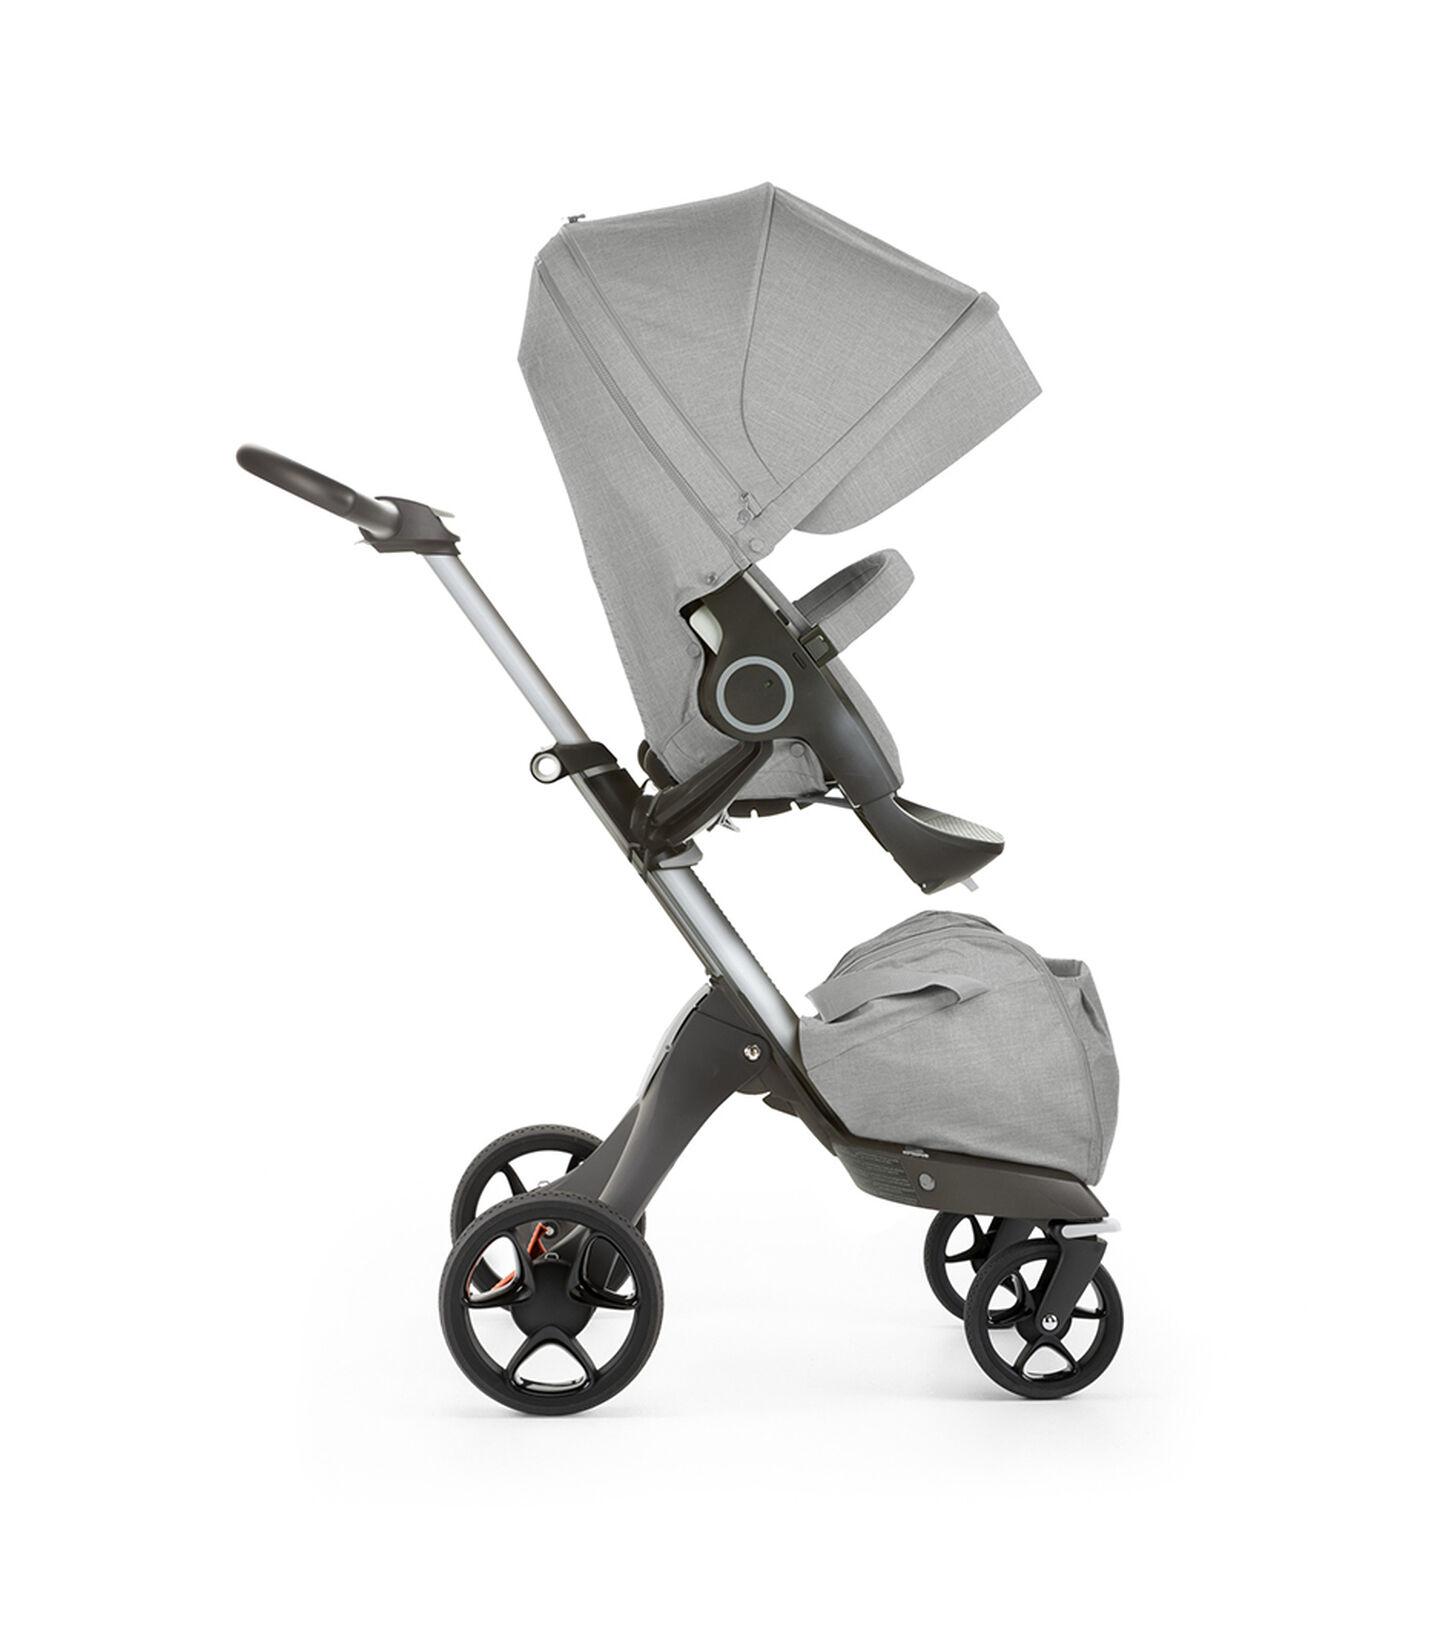 Stokke® Xplory® with Stokke® Stroller Seat, forward facing, active position. Grey Melange. New wheels 2016.